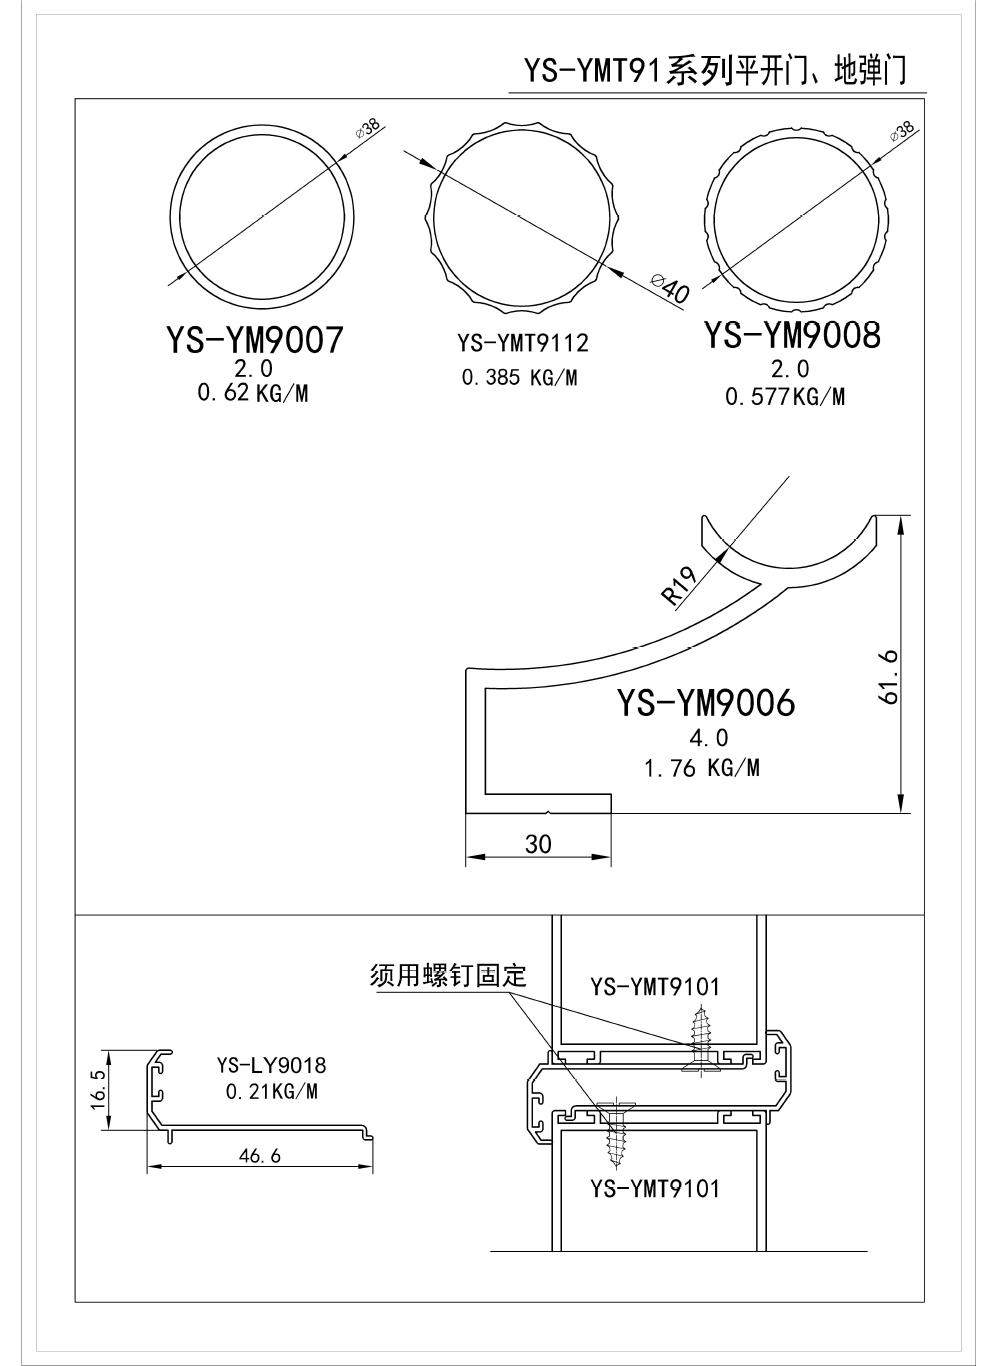 907--S44.2--BH1.9;3.0---------- YS-YMT91系列平开门、地弹门